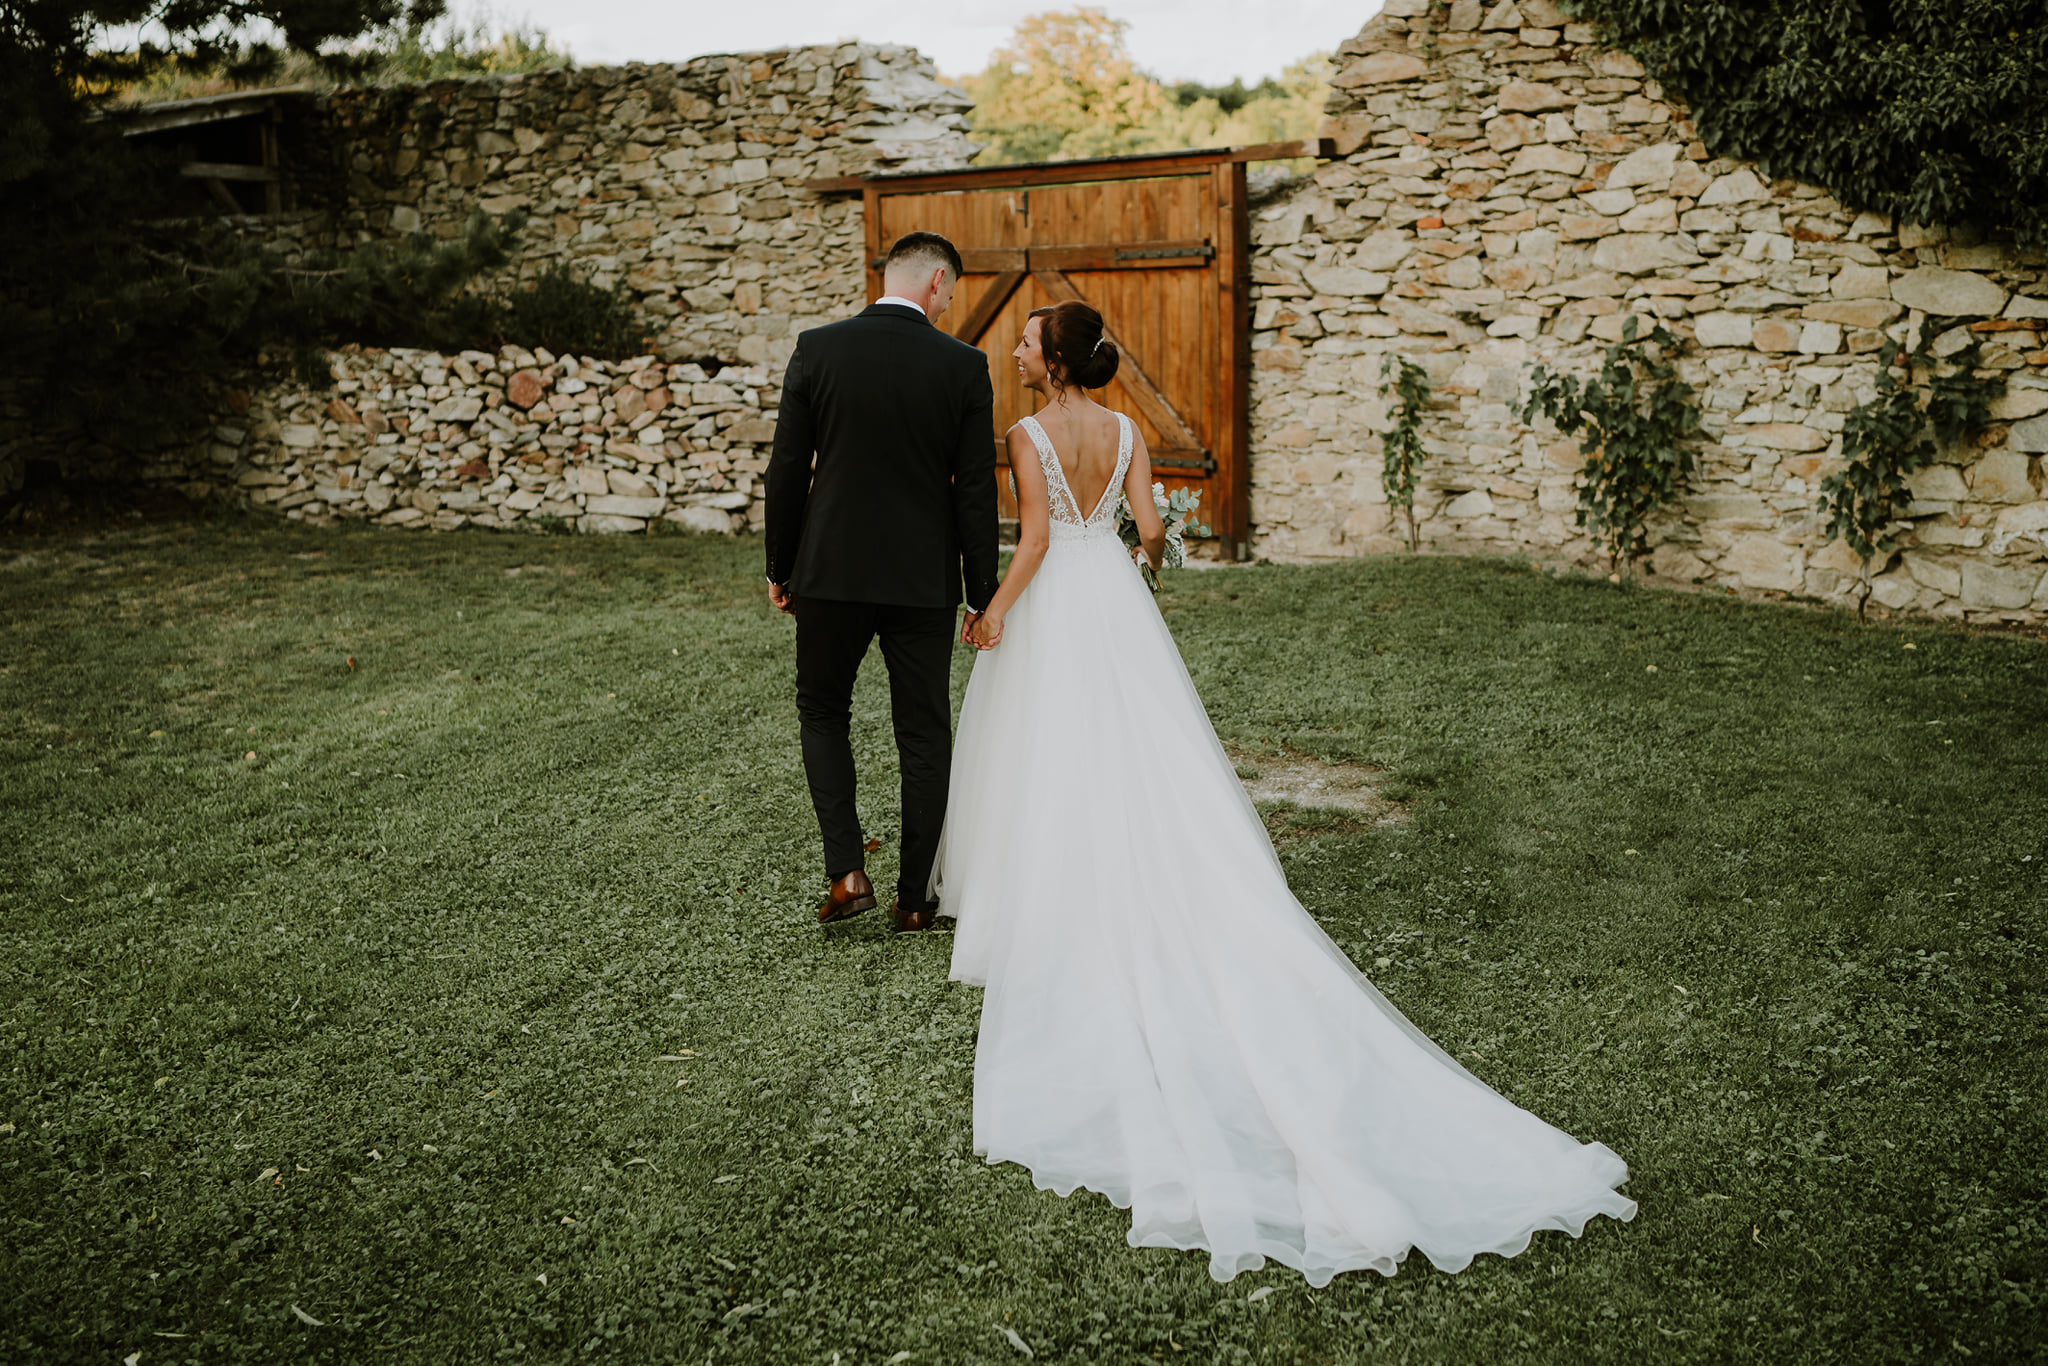 svadba-modrajpg